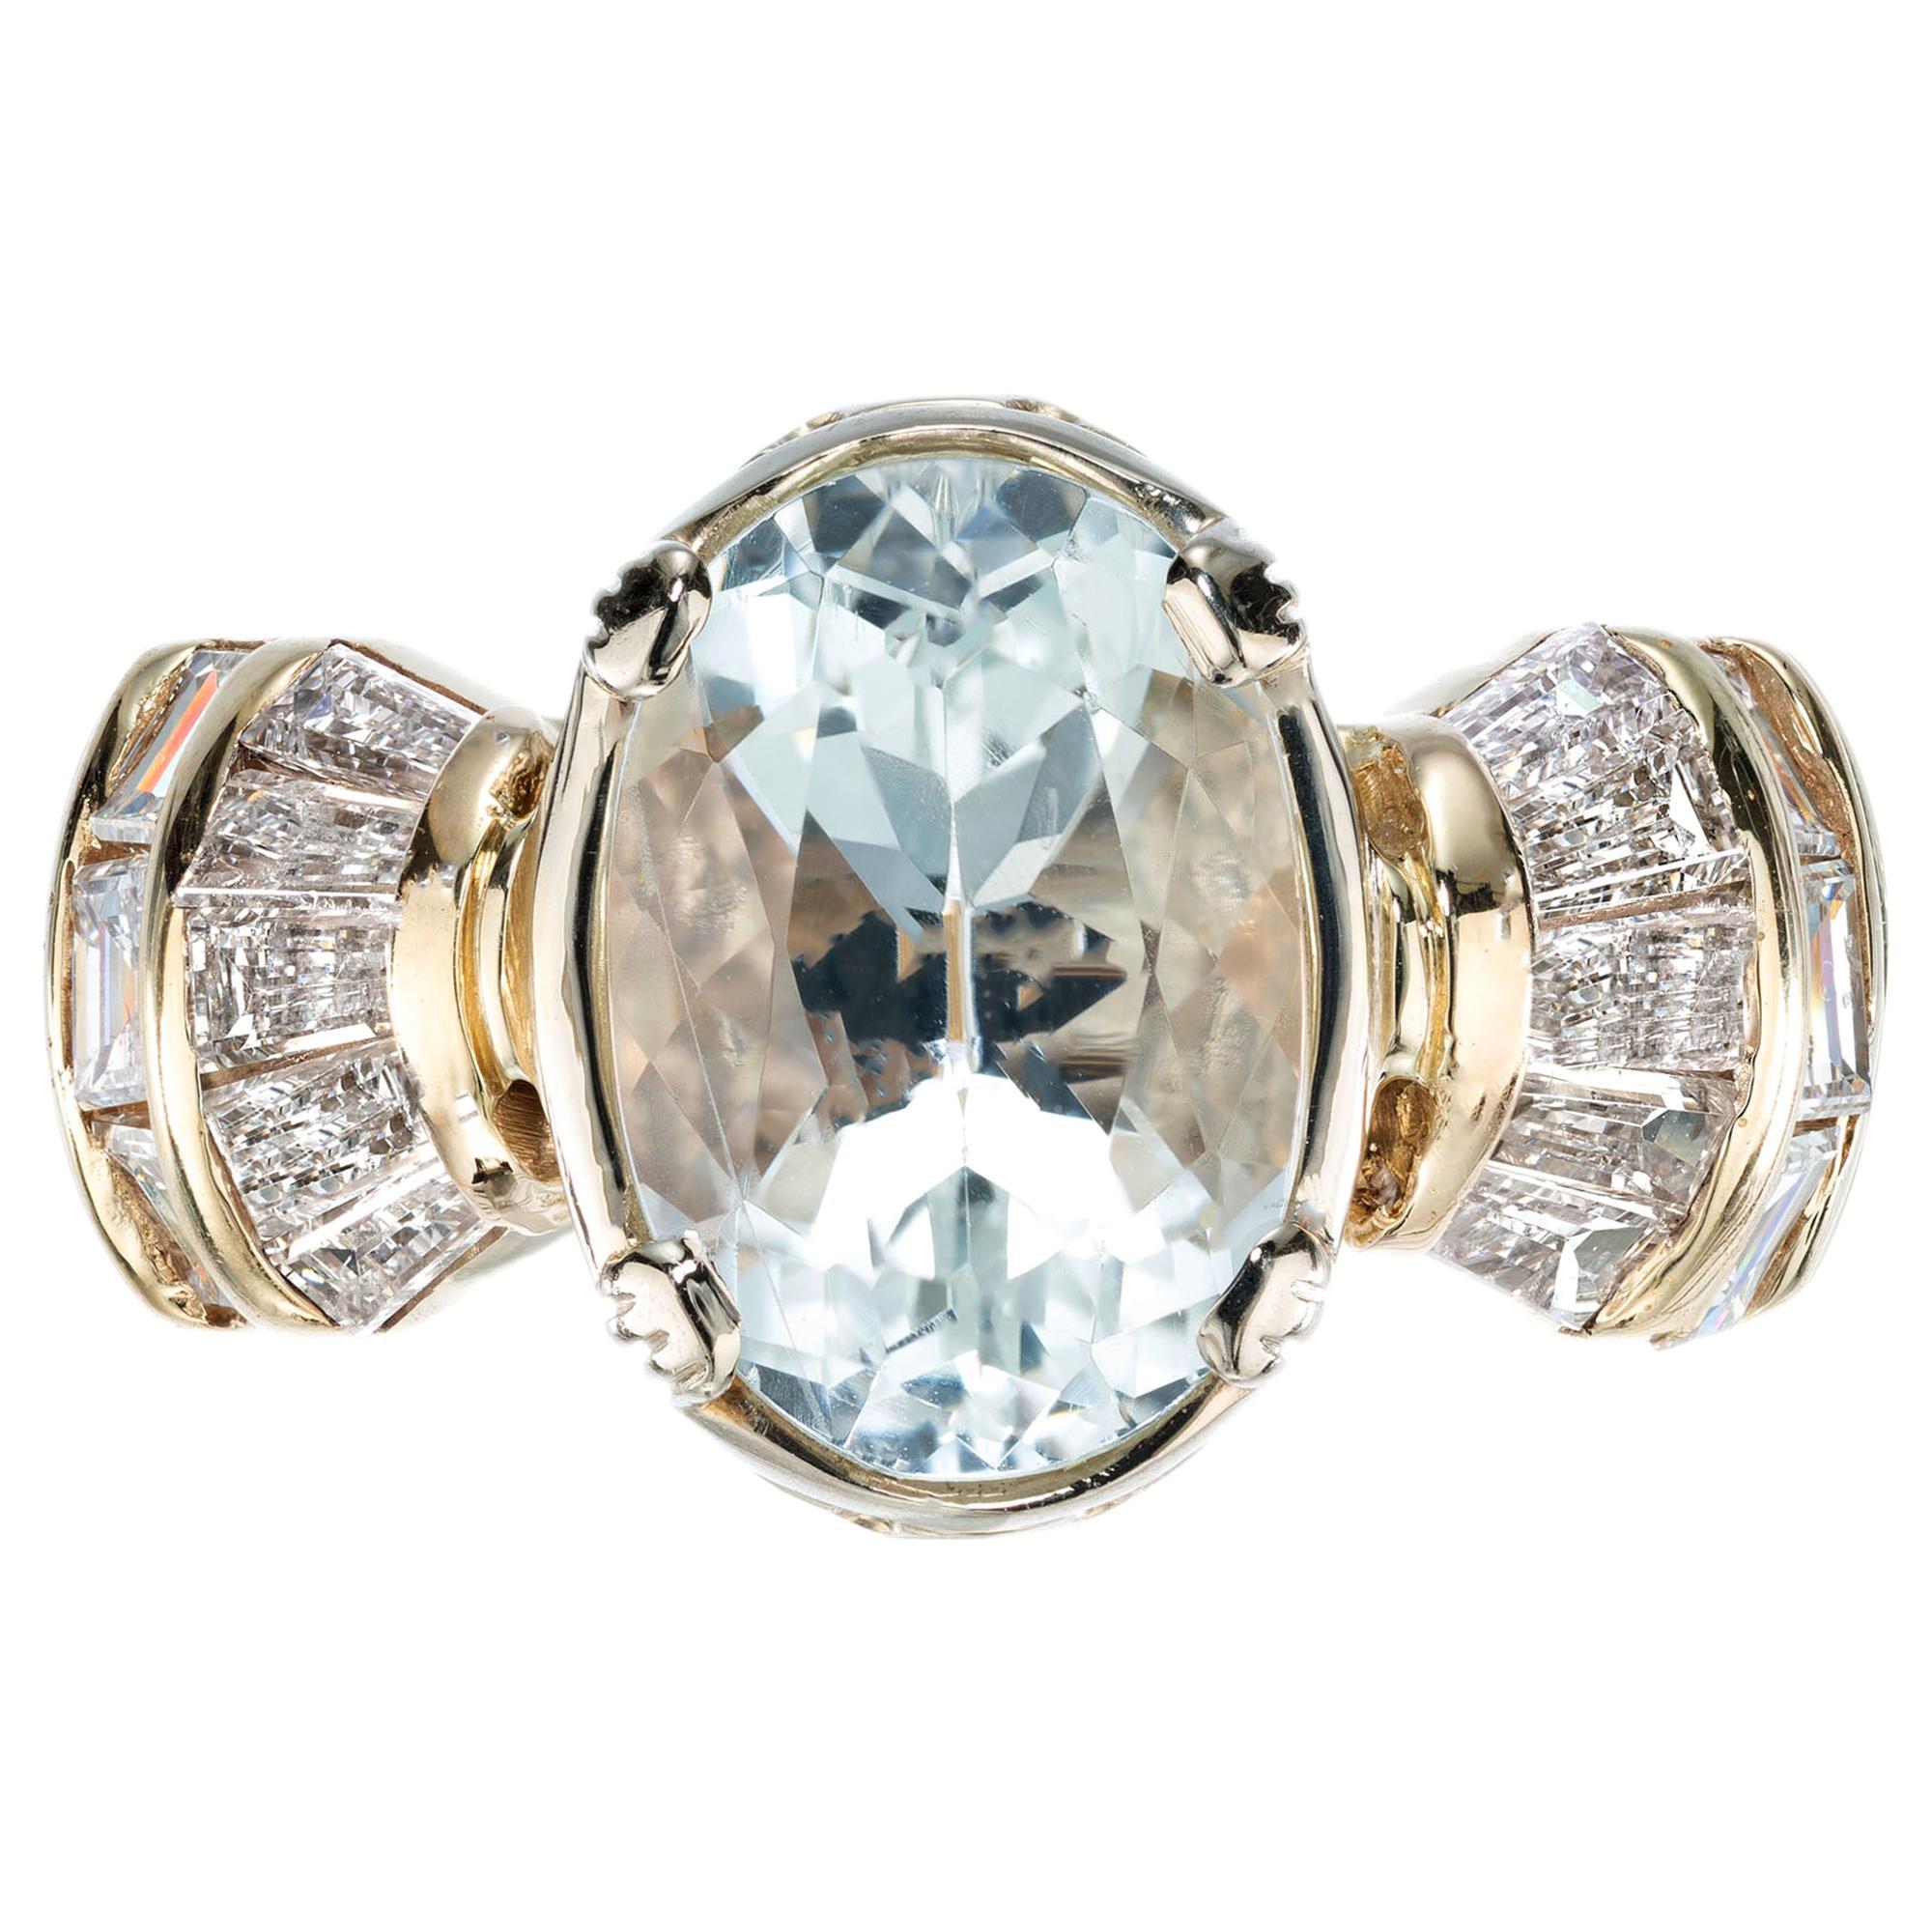 3.72 Carat Oval Aquamarine Baguette Diamond Gold Cocktail Ring